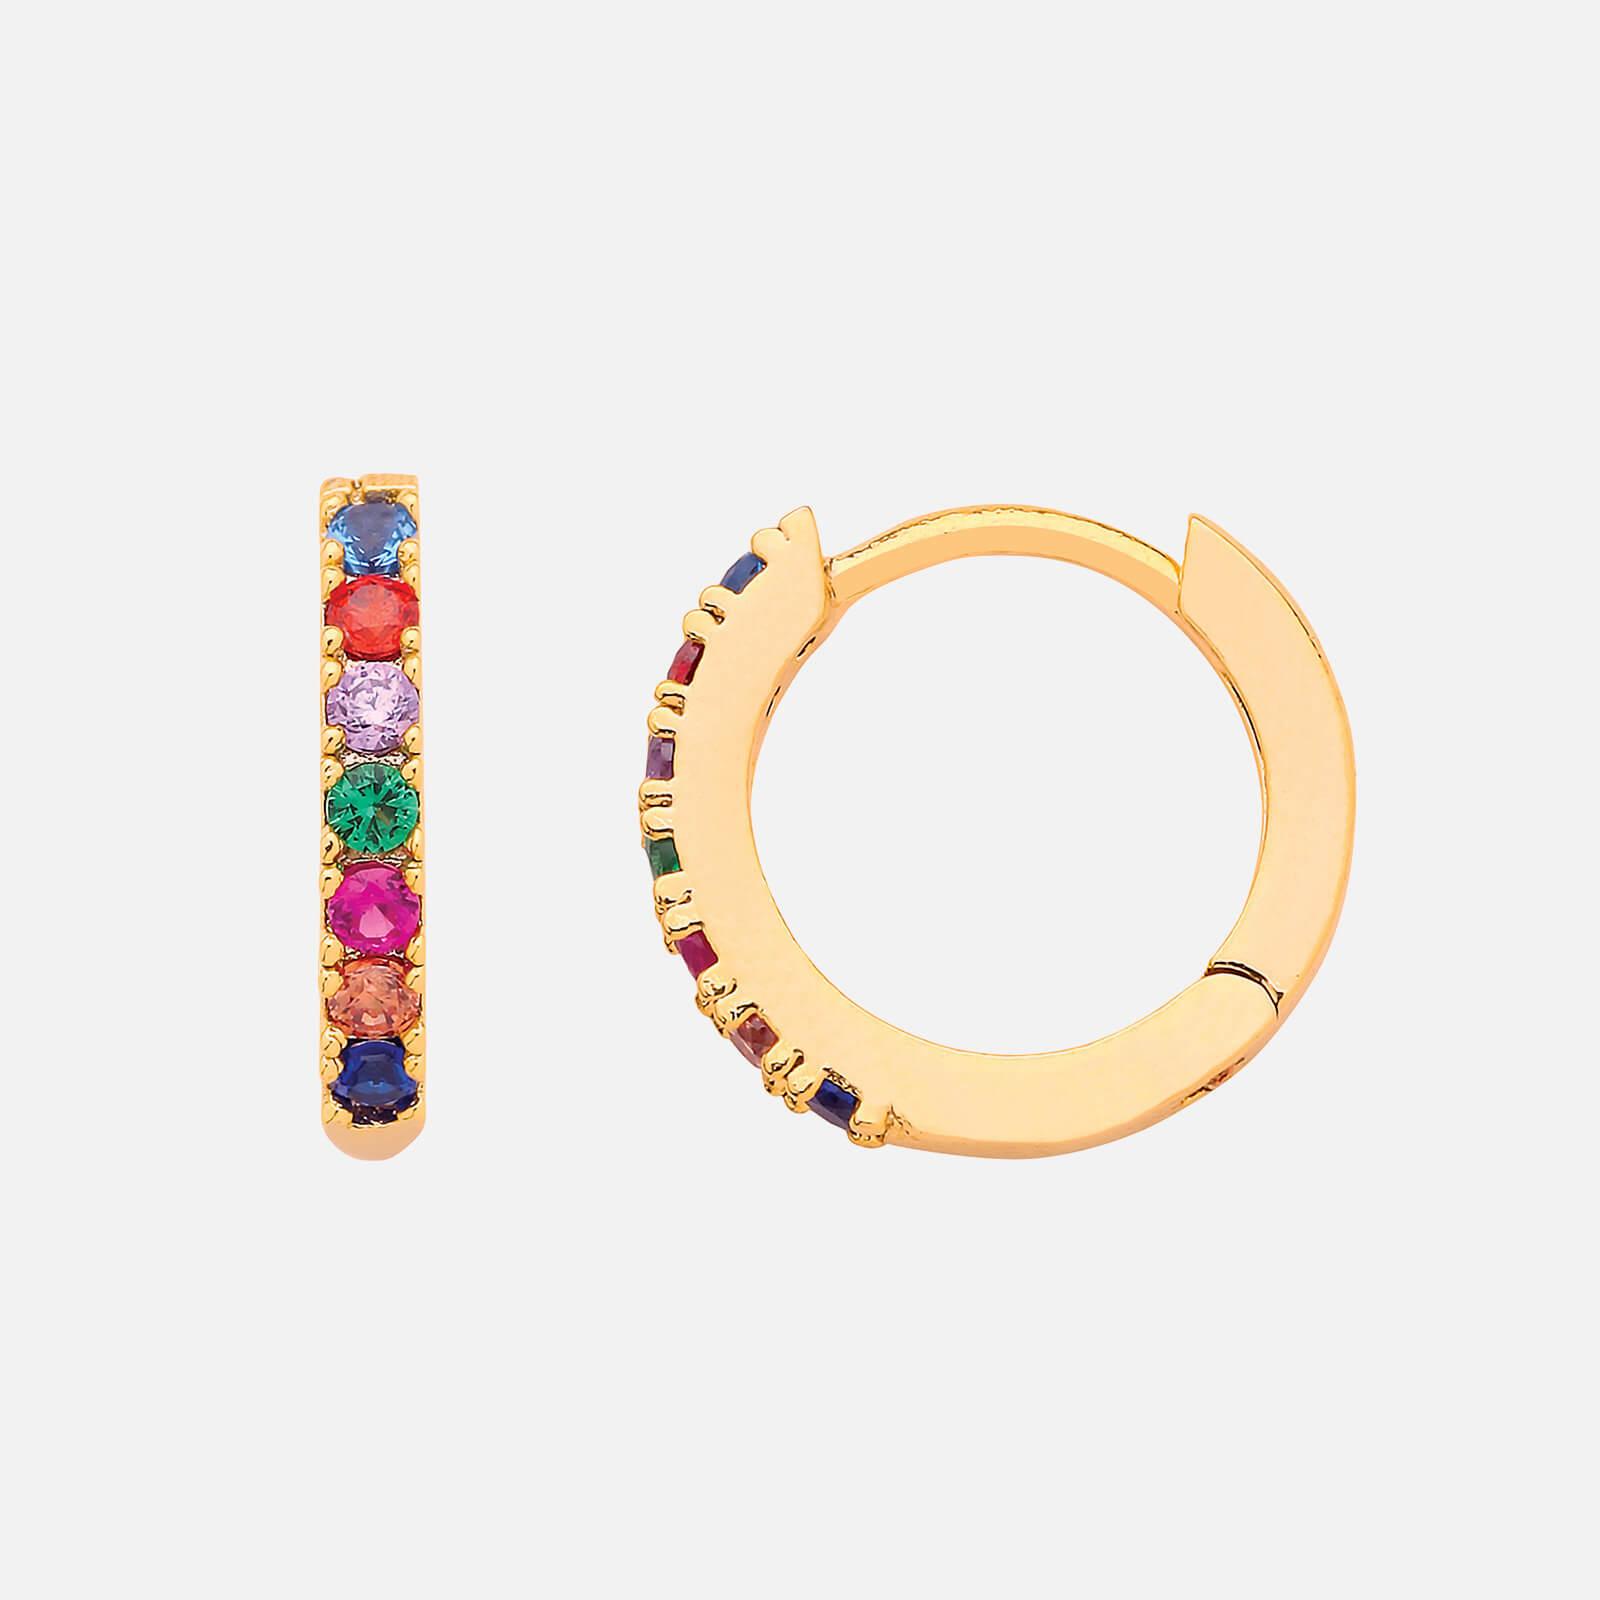 Estella Bartlett Women's Multicoloured Pave Hoop Earrings - Gold Plated/NP